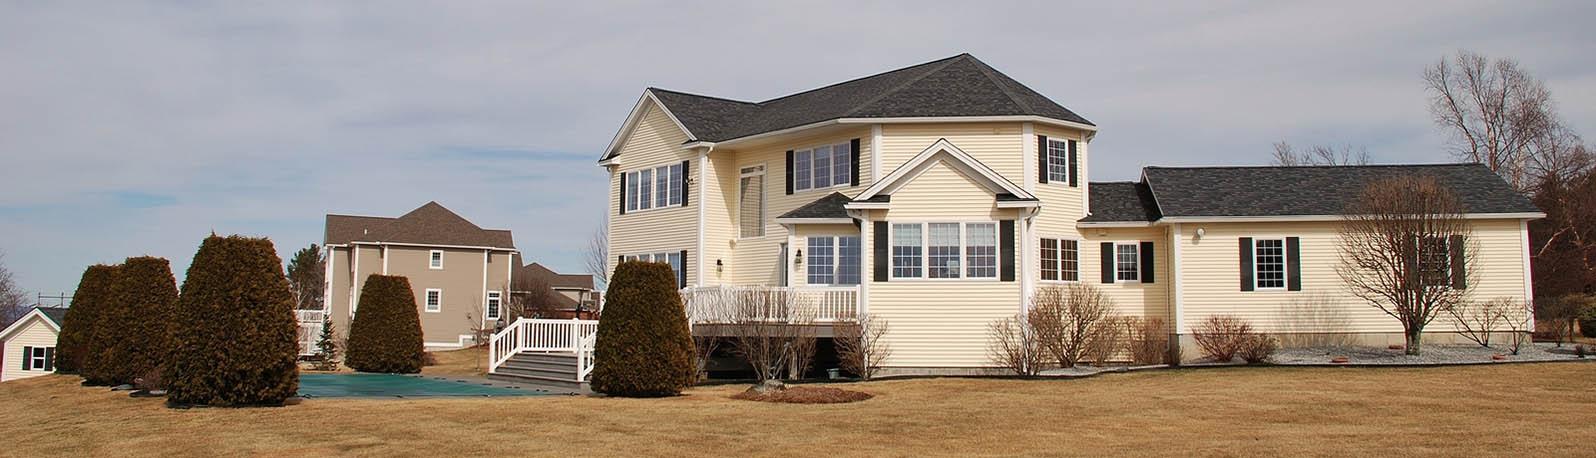 Chittenden County Real Estate Market 2016